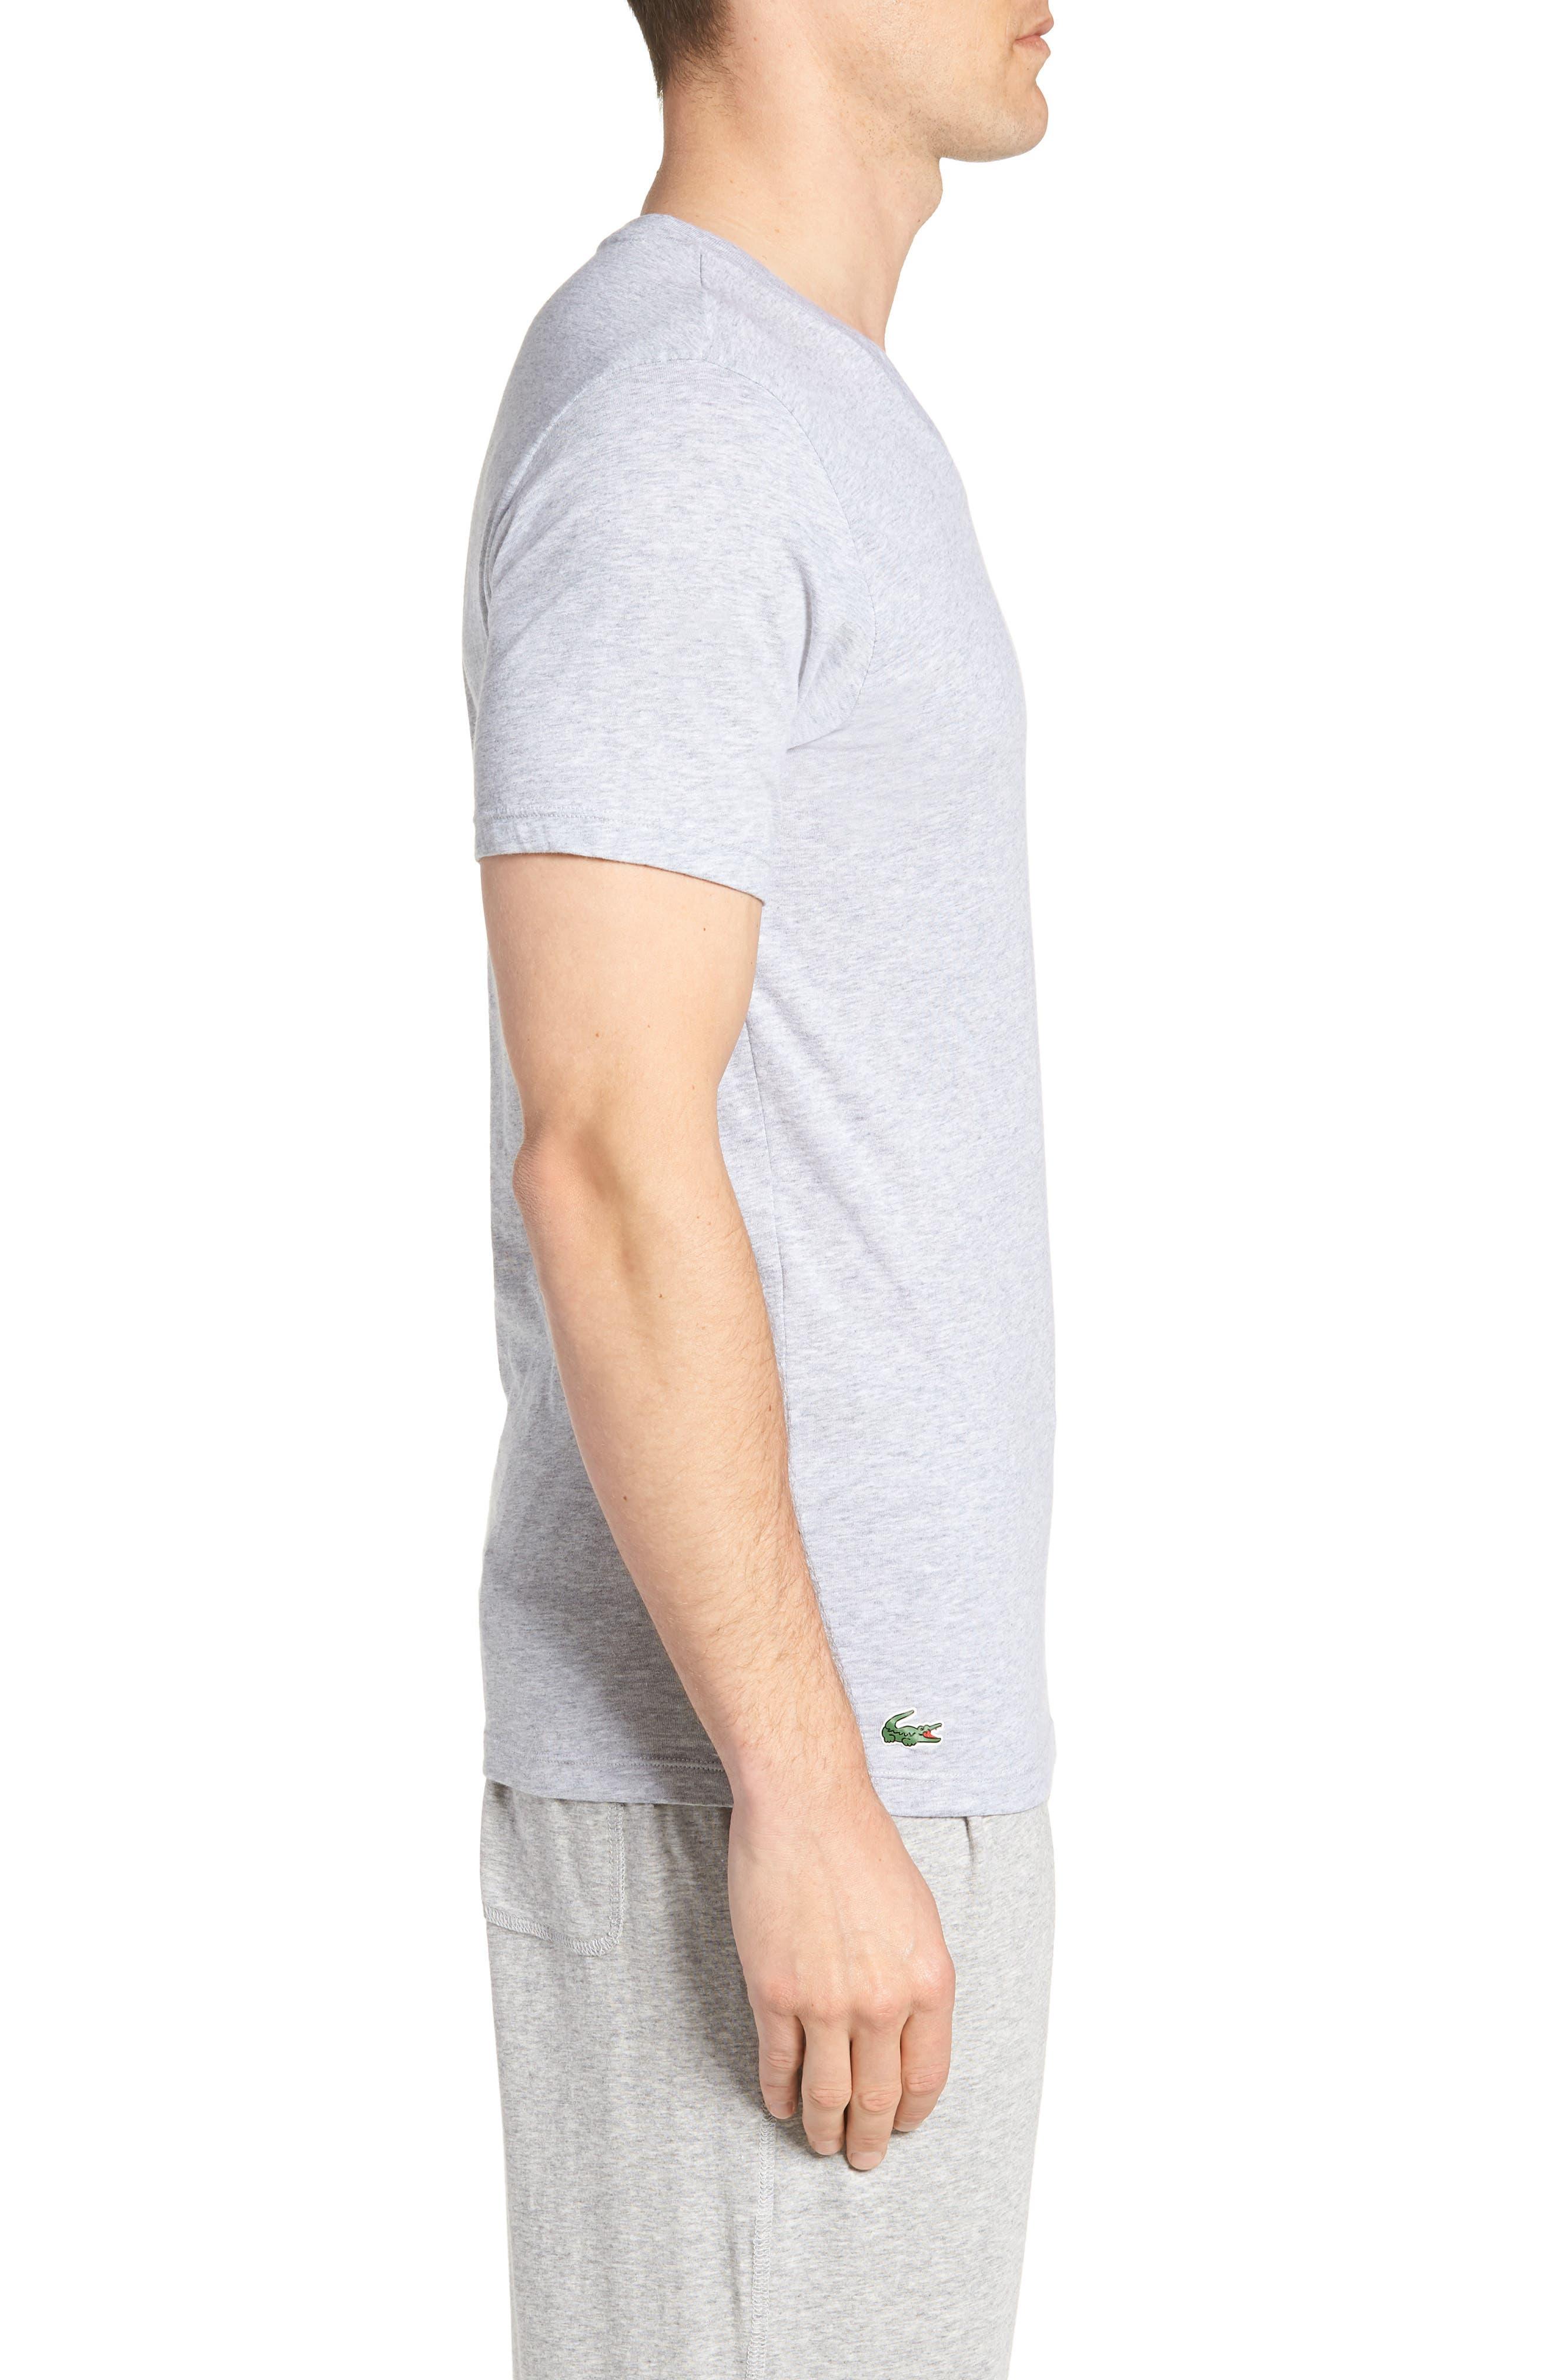 LACOSTE,                             3-Pack Slim Fit V-Neck T-Shirts,                             Alternate thumbnail 3, color,                             BLACK/ GREY/ WHITE